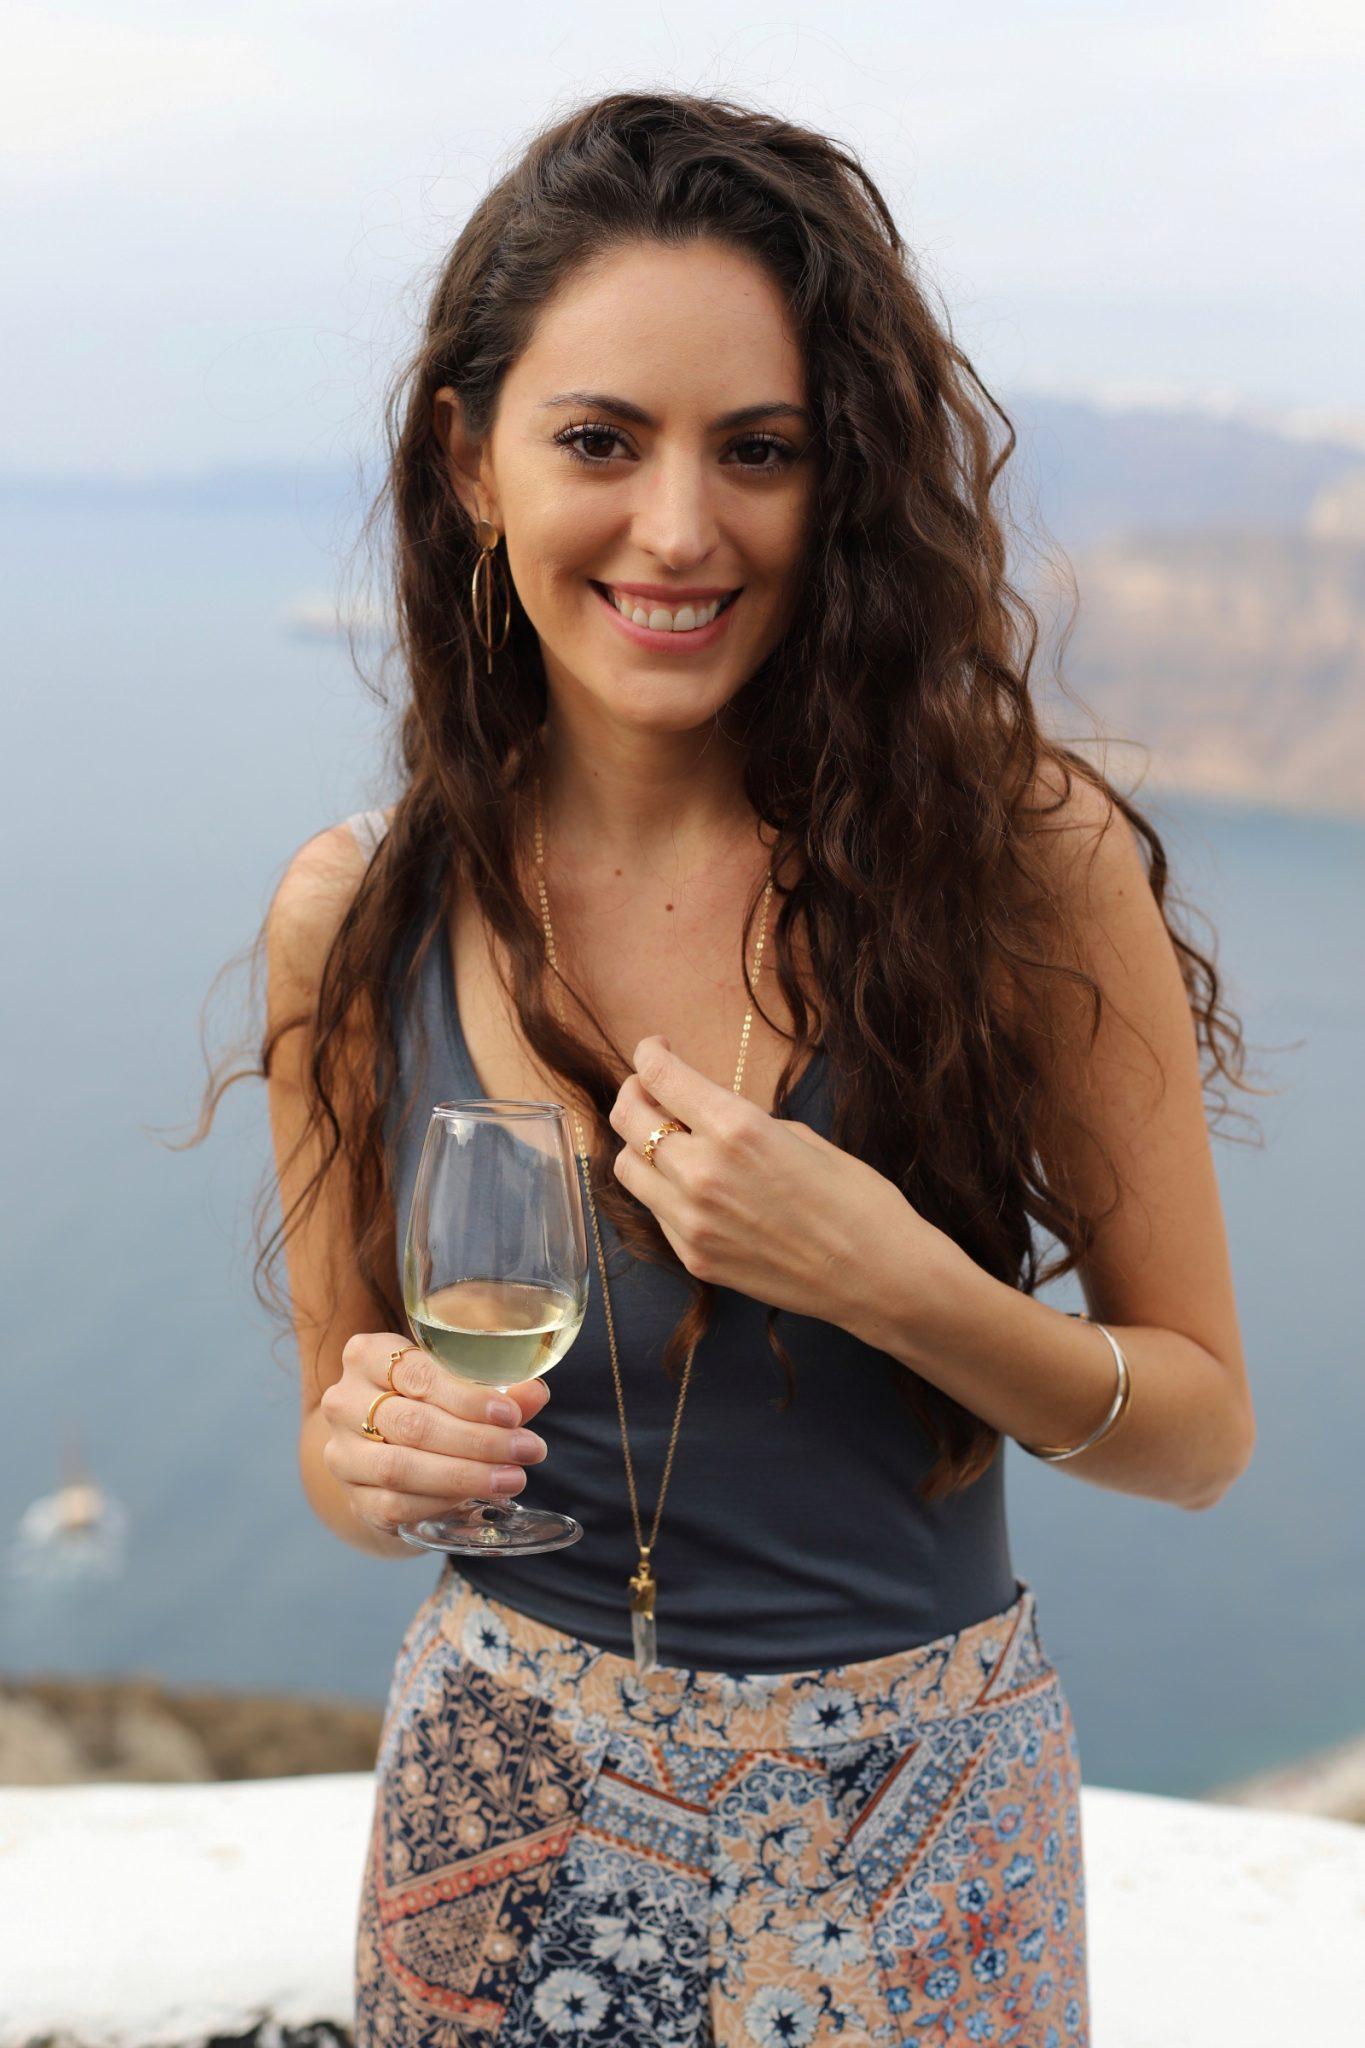 white wine in santorini, best wineries in Santorini, greek wineries, best wineries in greece, gavalas winery, venetsanos winery, south moon under